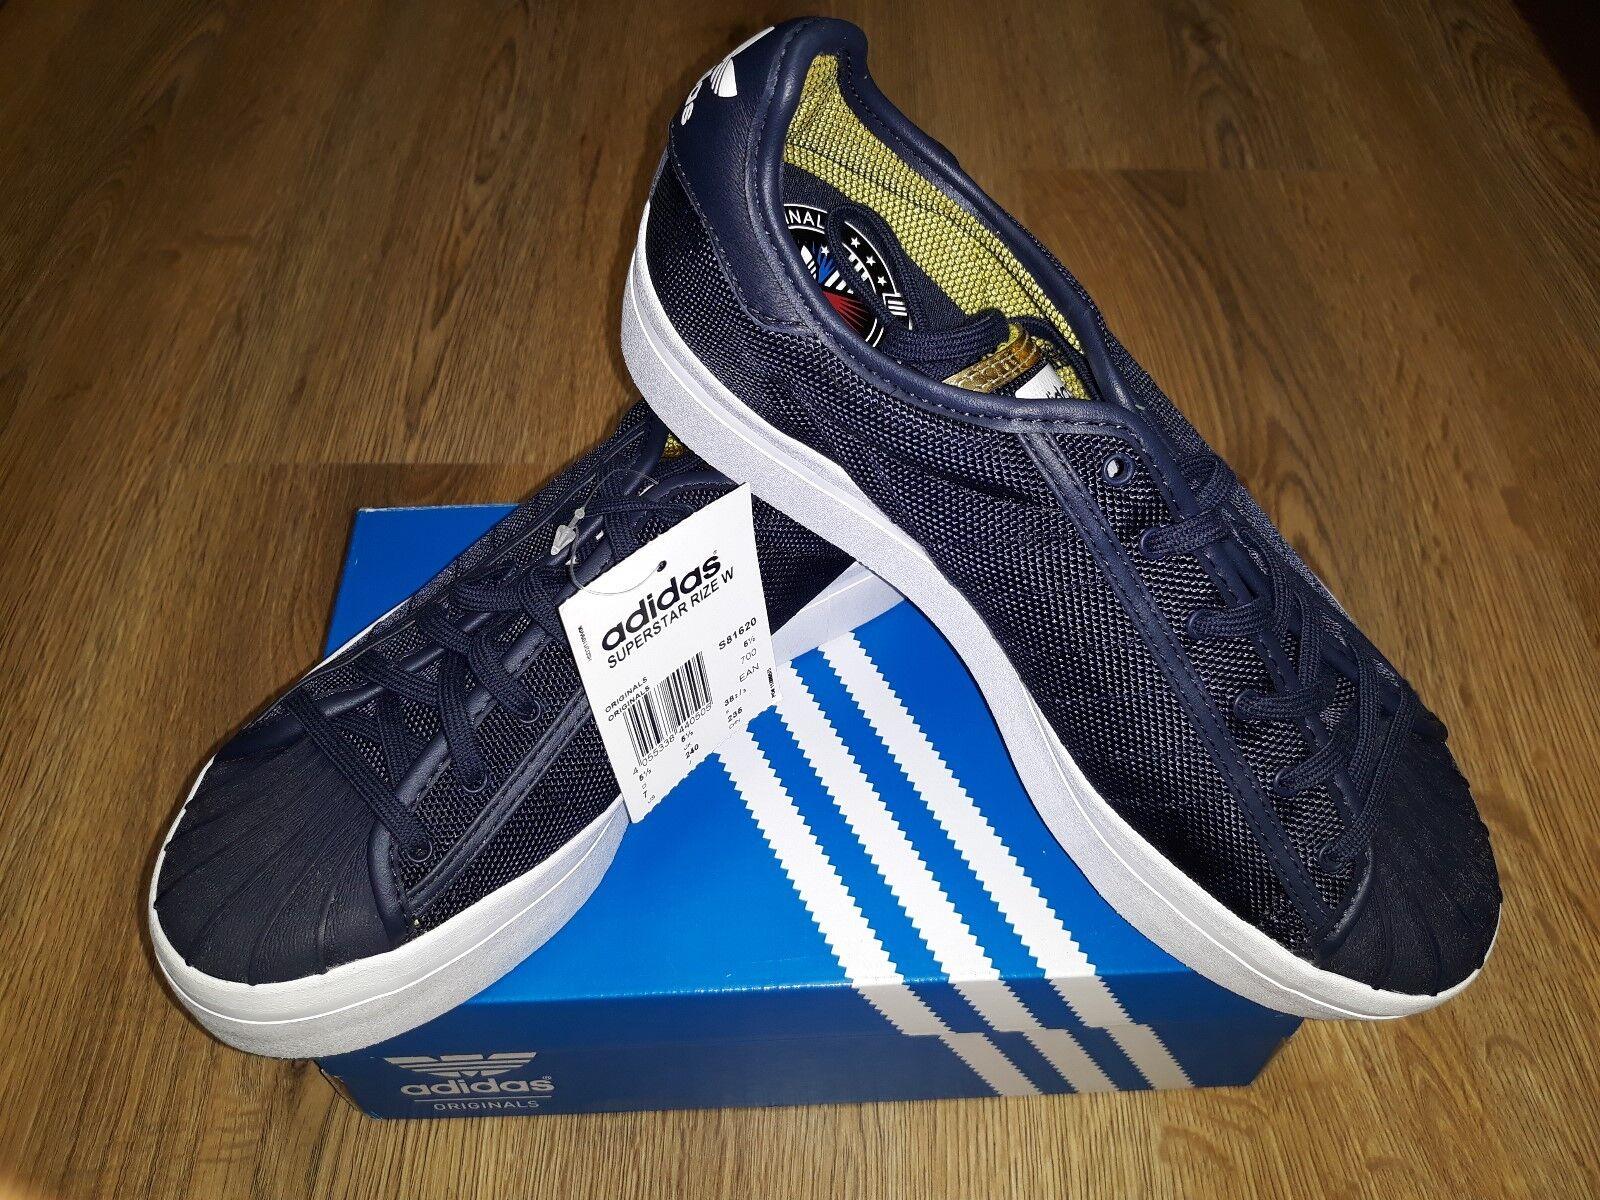 Adidas Superstar Rize W S81620 Femmes Basket